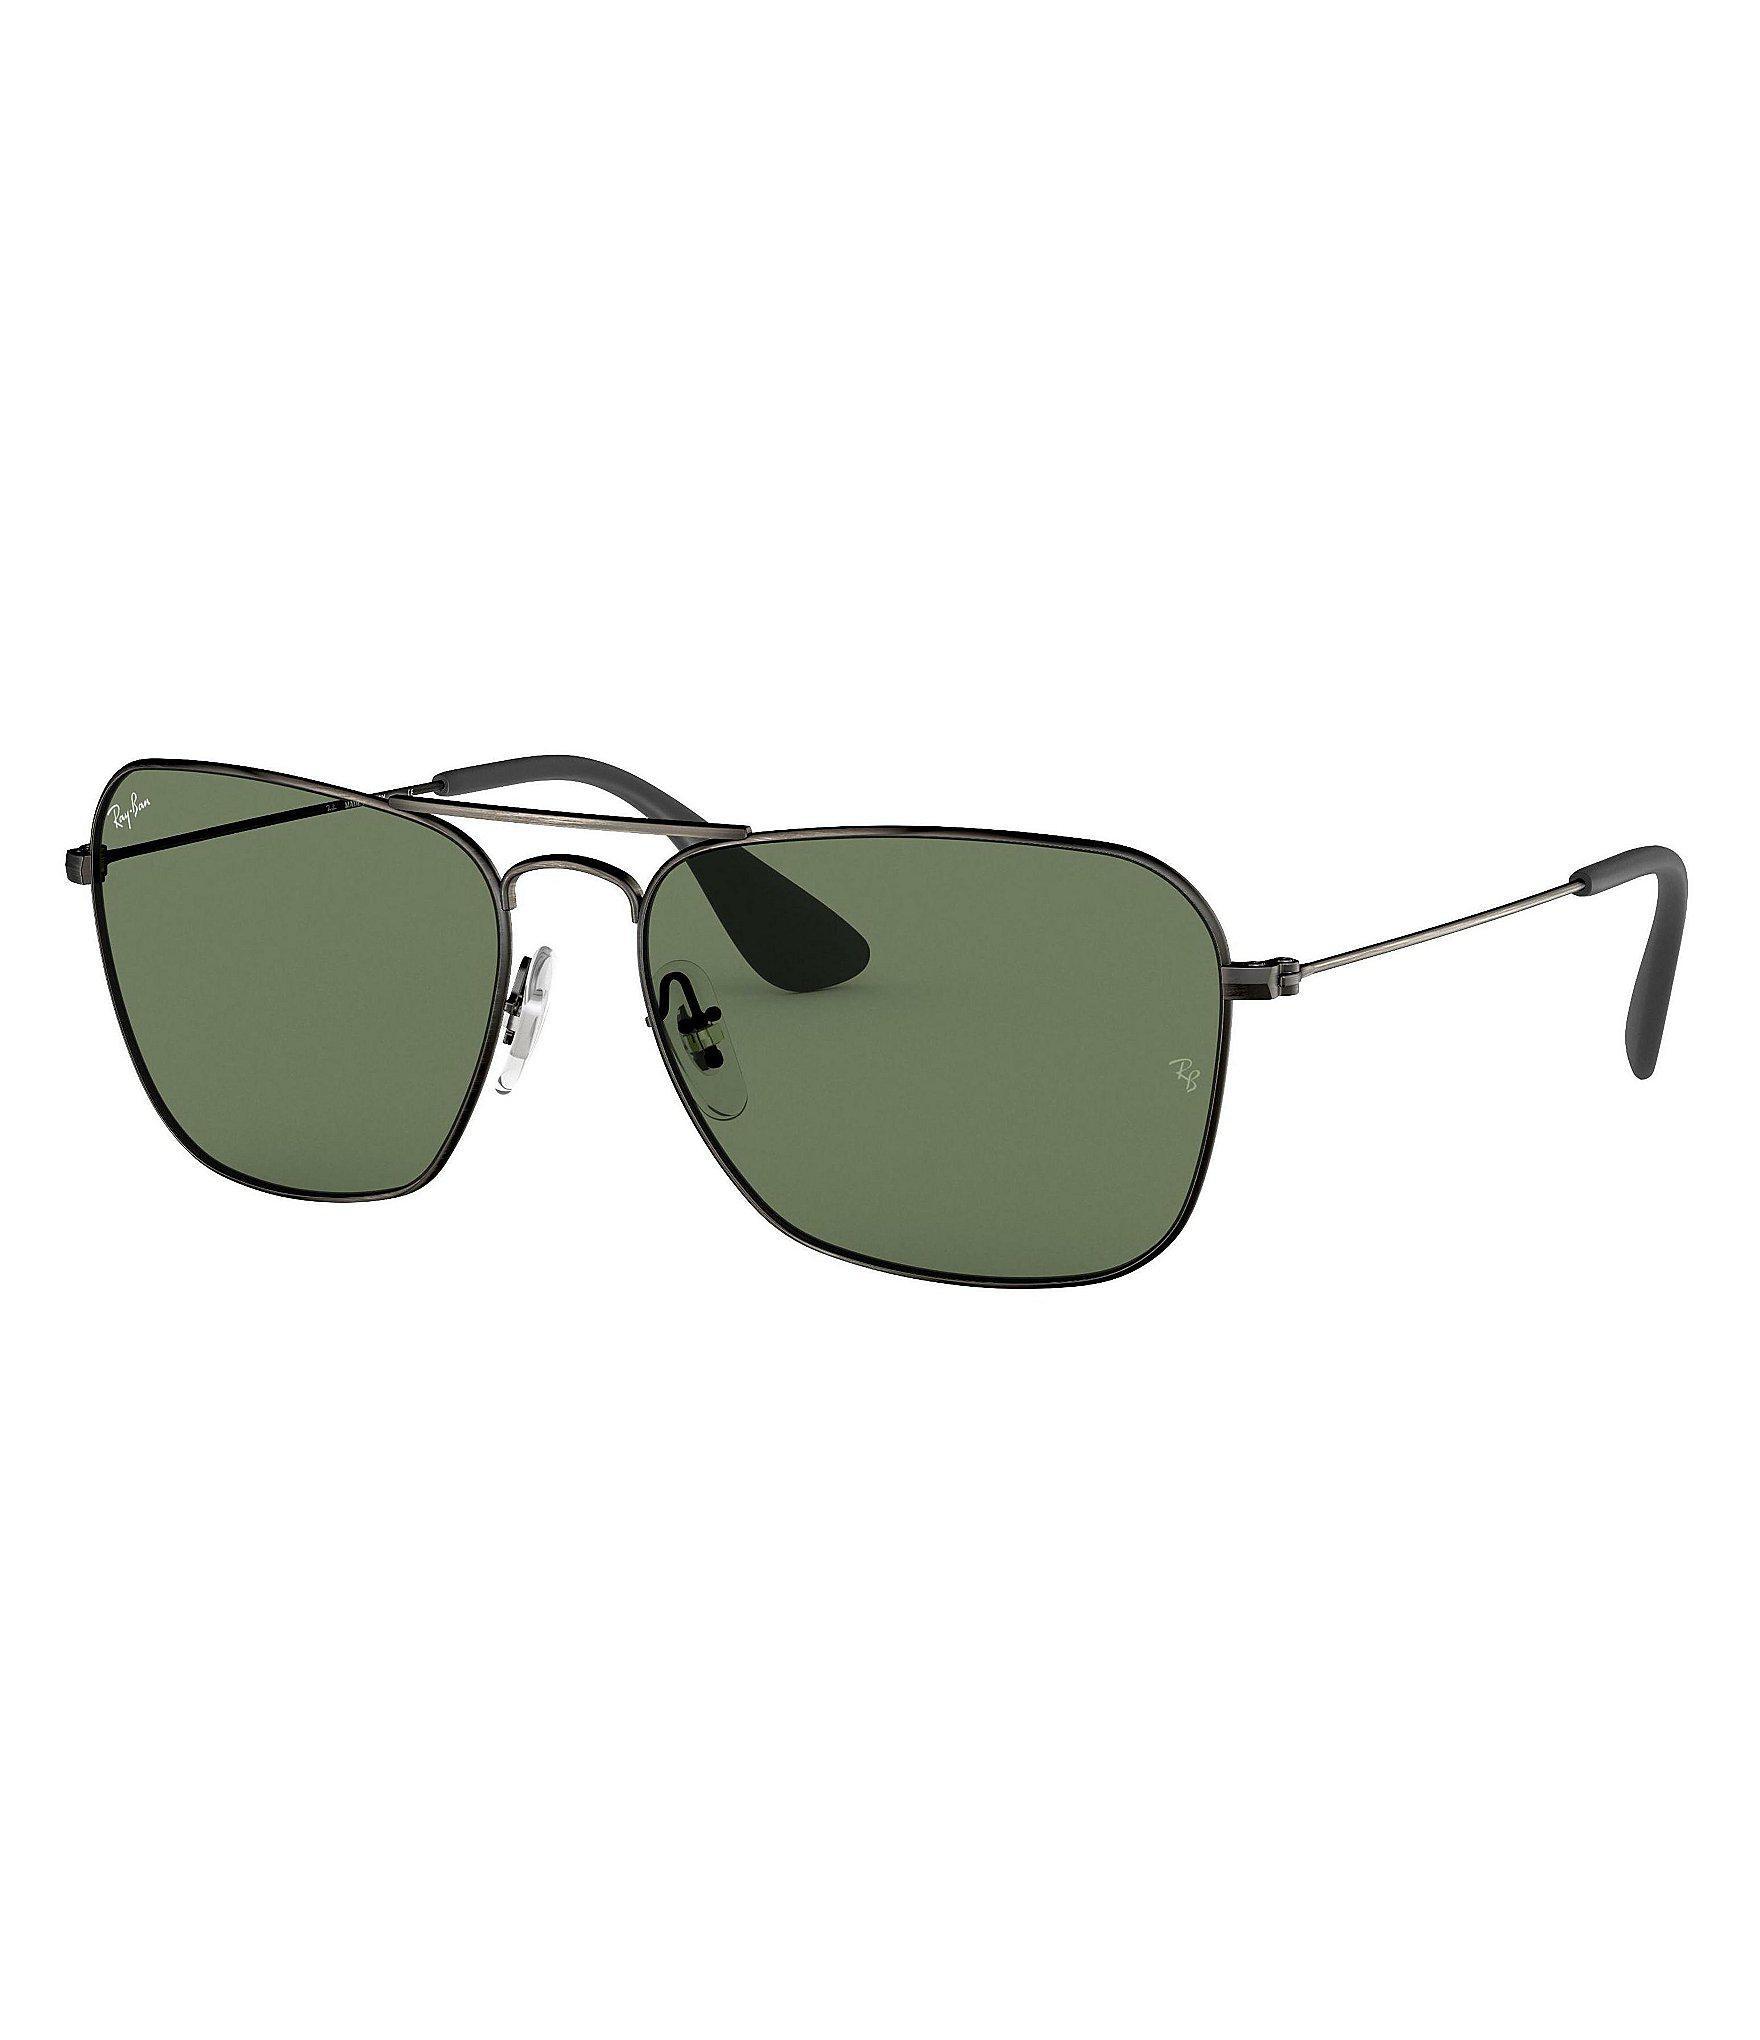 4cd56122c0 Lyst - Ray-Ban Navigator Sunglasses in Green for Men